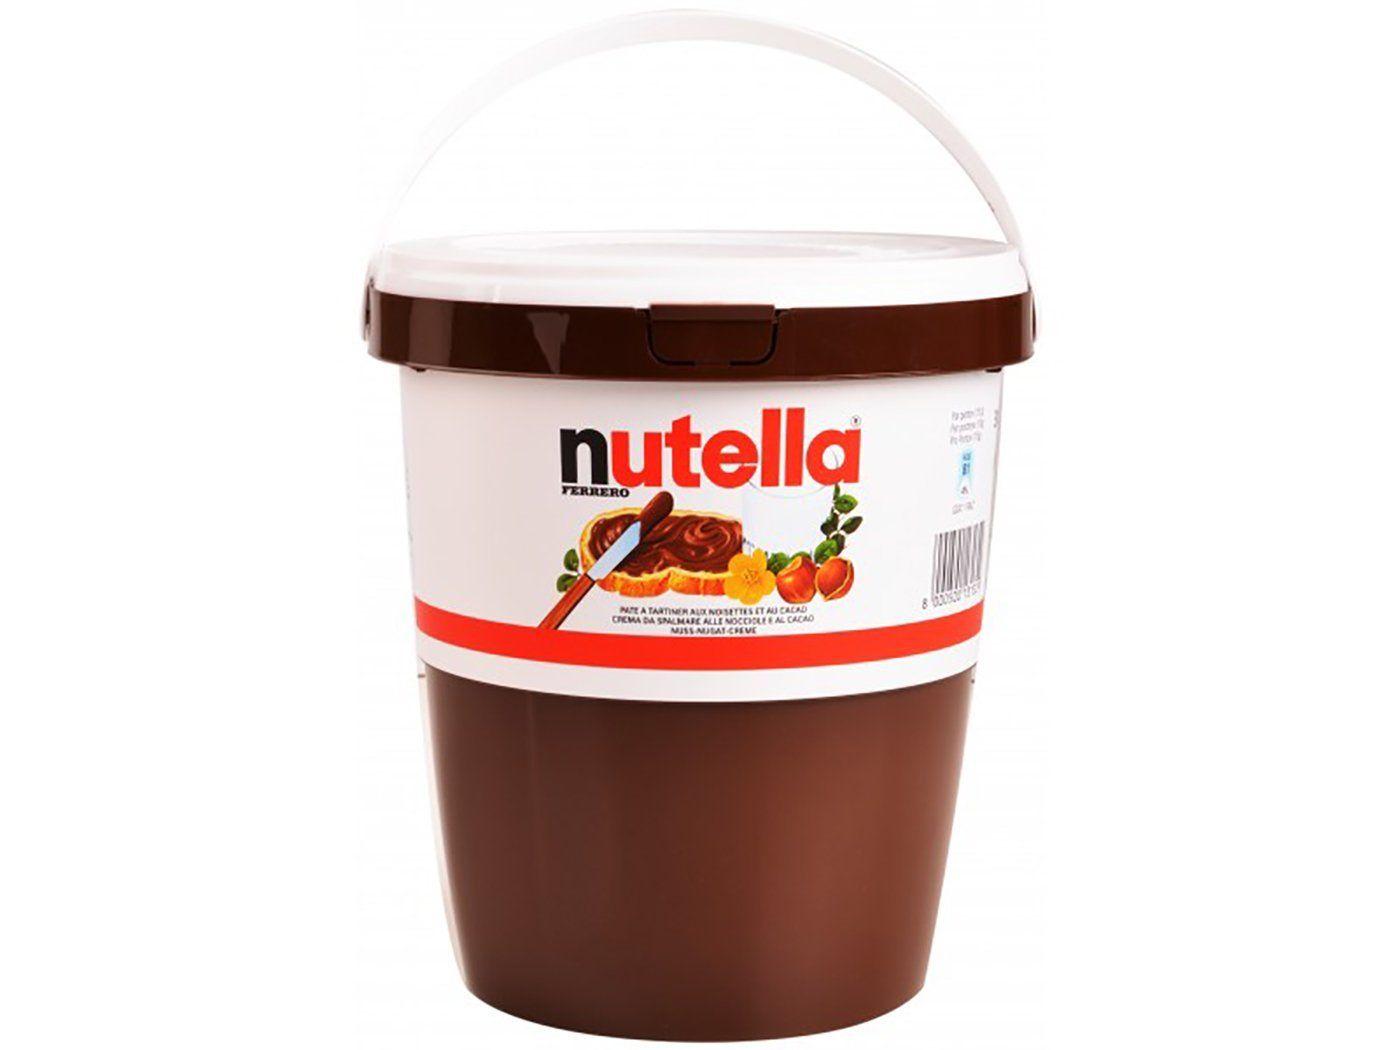 Ferrero - Nutella - 3kg: Amazon.de: Lebensmittel & Getränke  OMG! 3kg Liebe :D